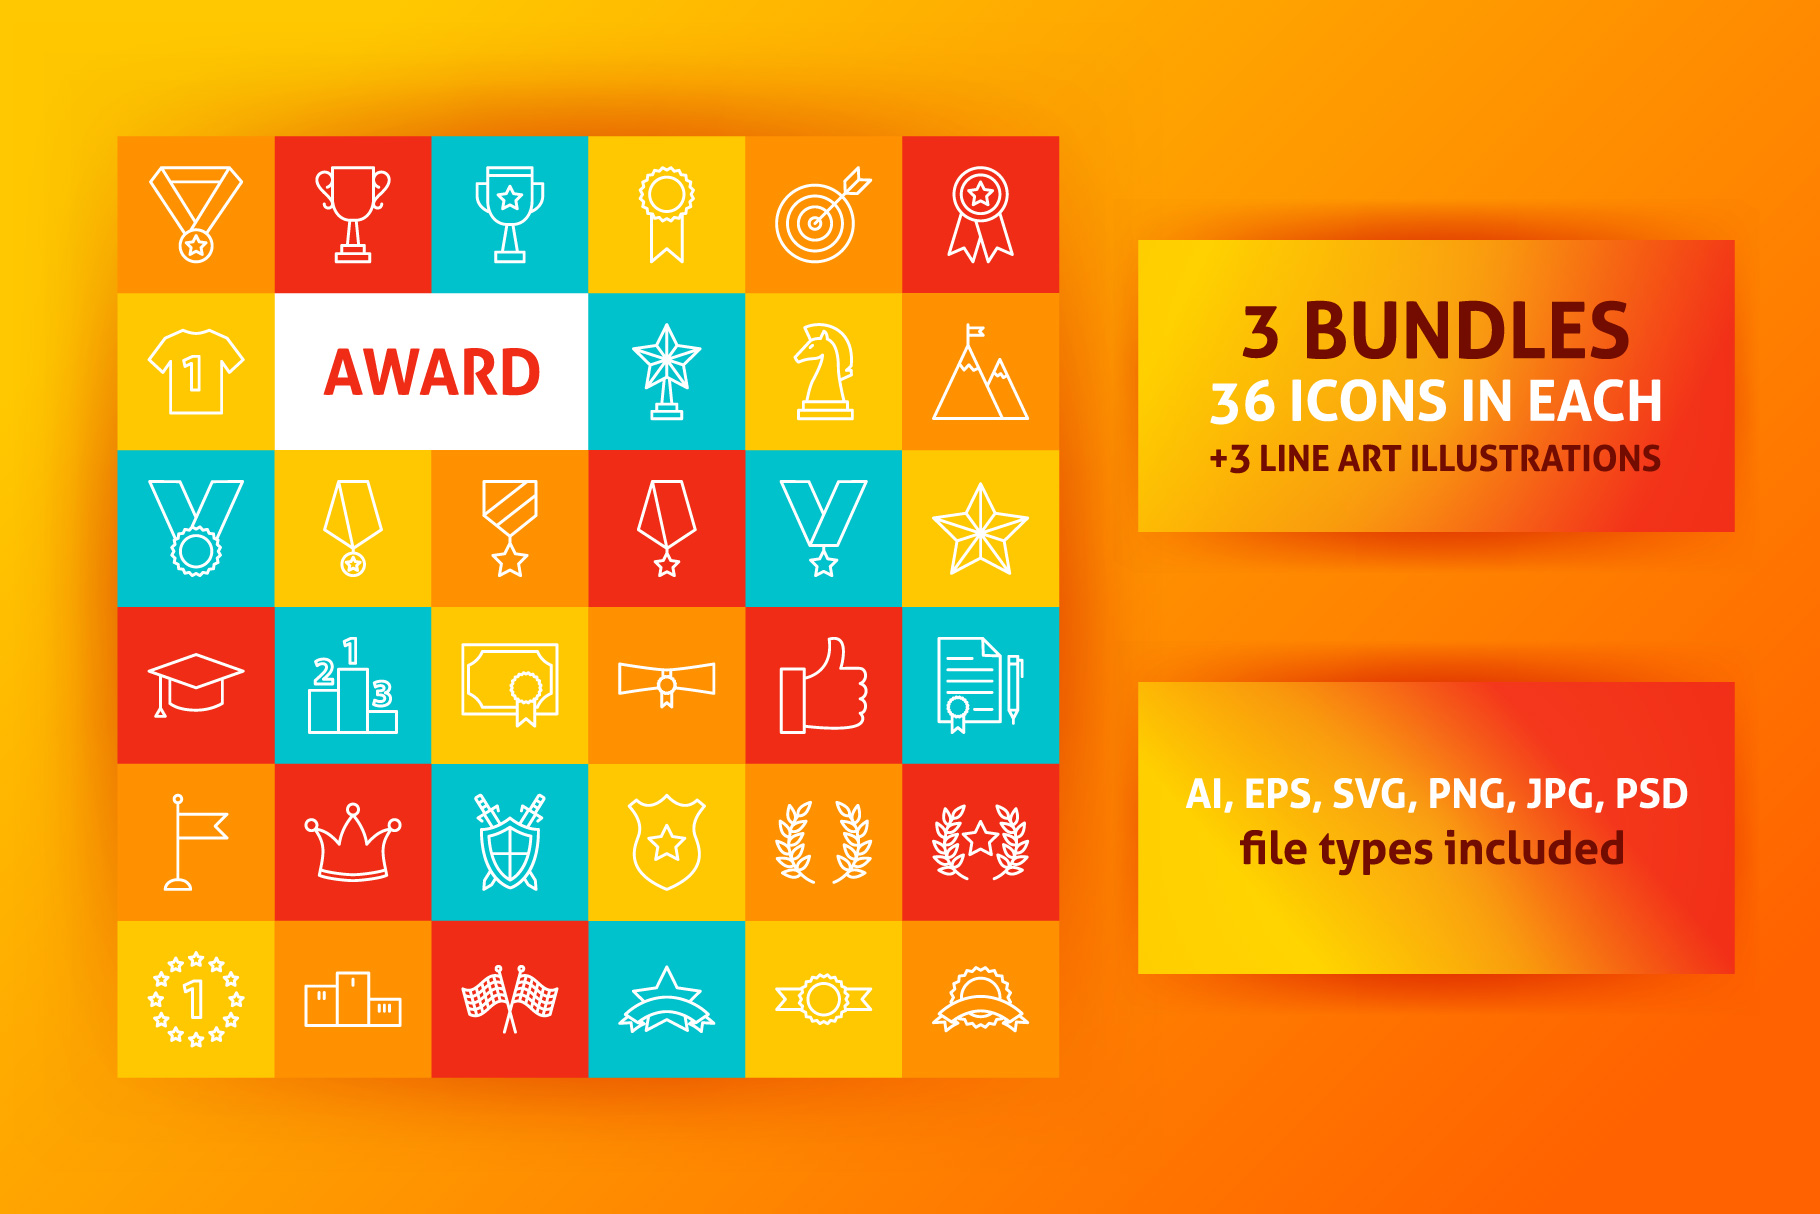 Award Line Art Icons example image 1